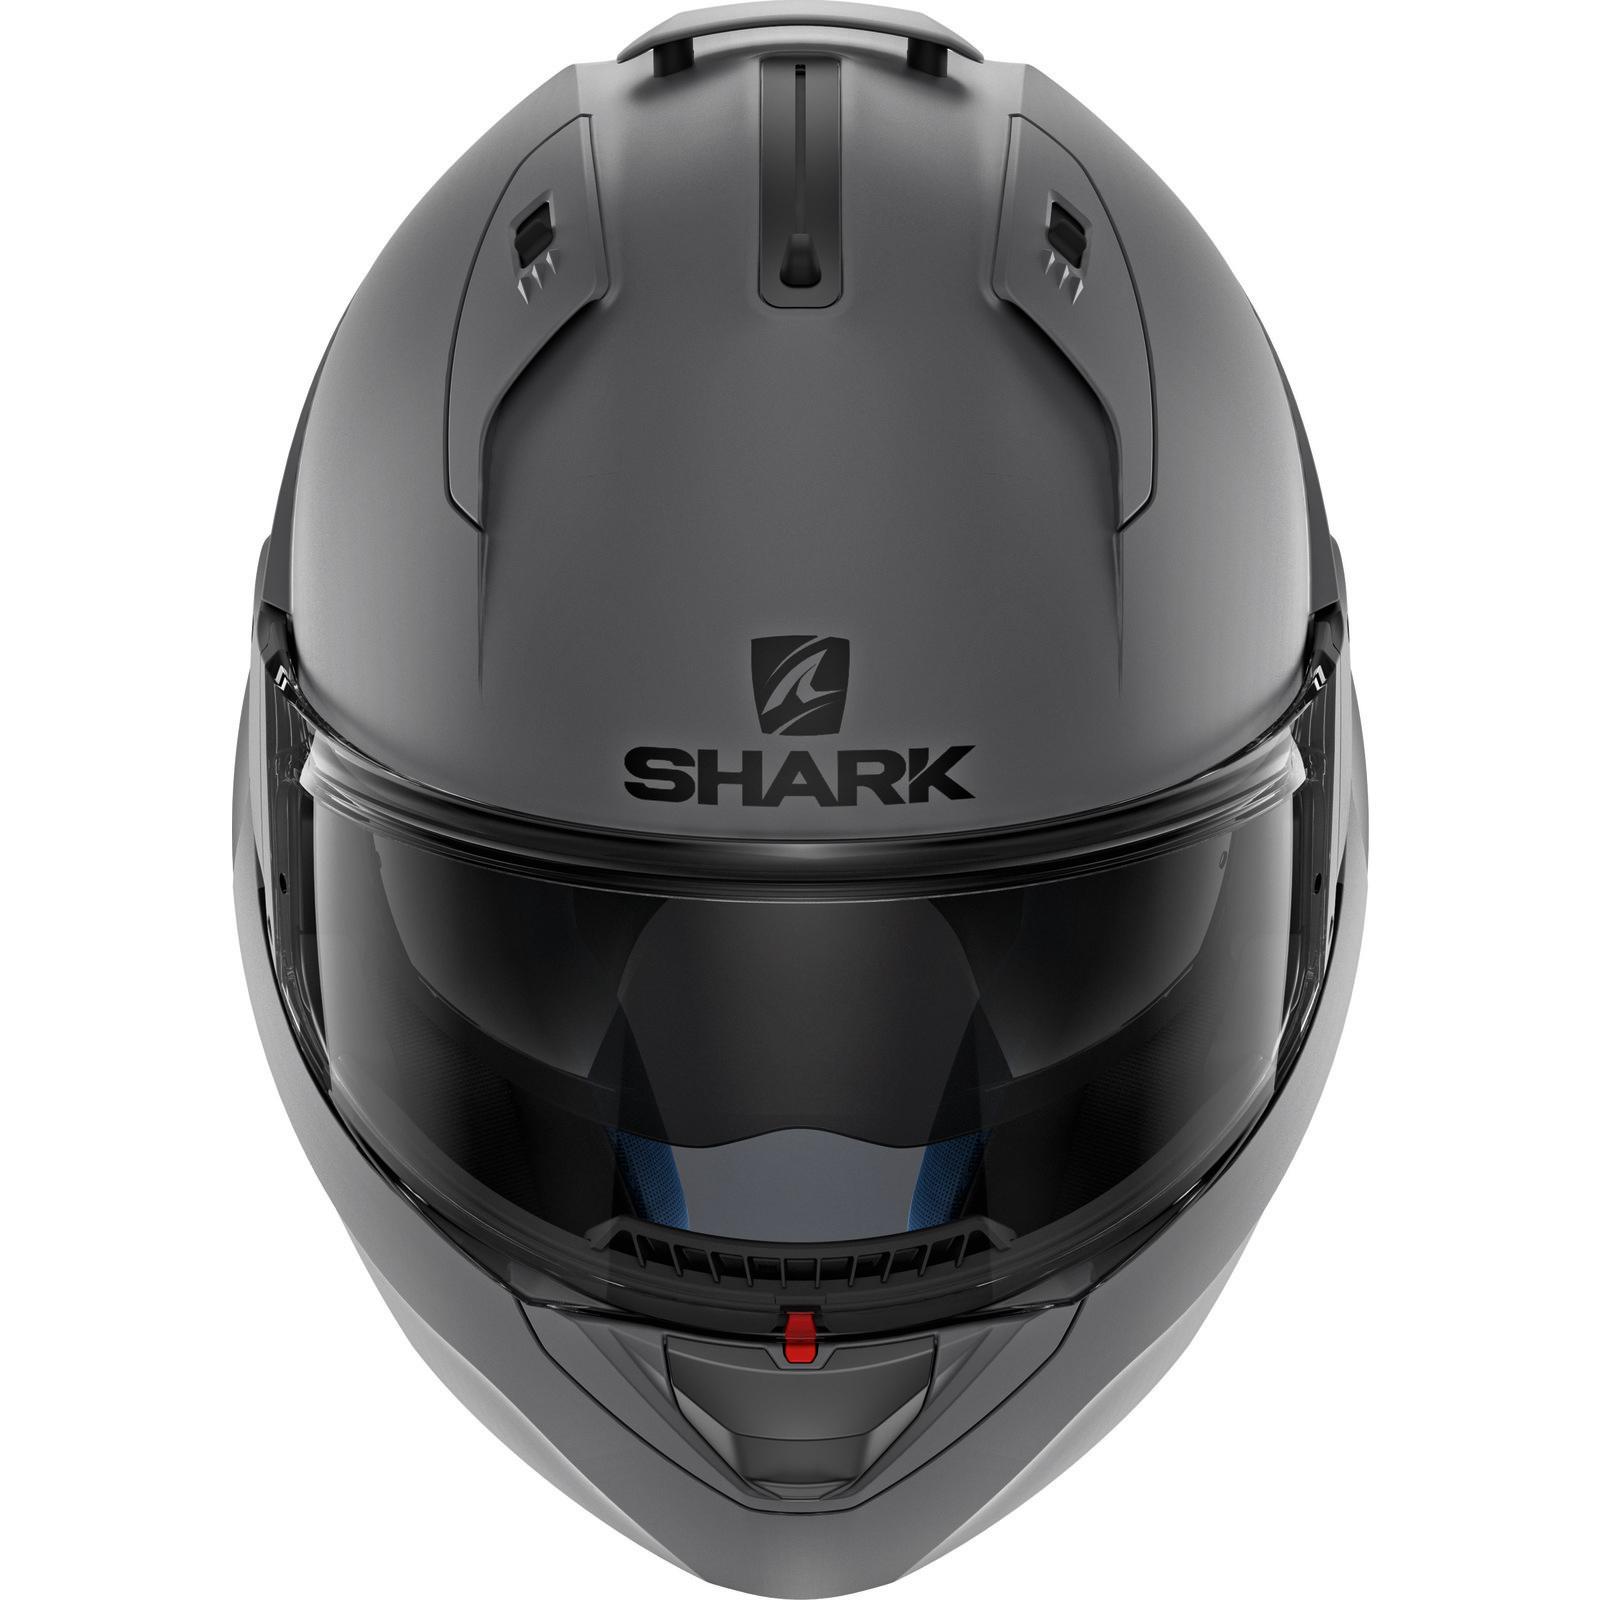 Shark-Evo-One-2-Vide-Uni-Mat-Anthracite-avant-Basculable-Casque-Moto-Ama-Bouchon